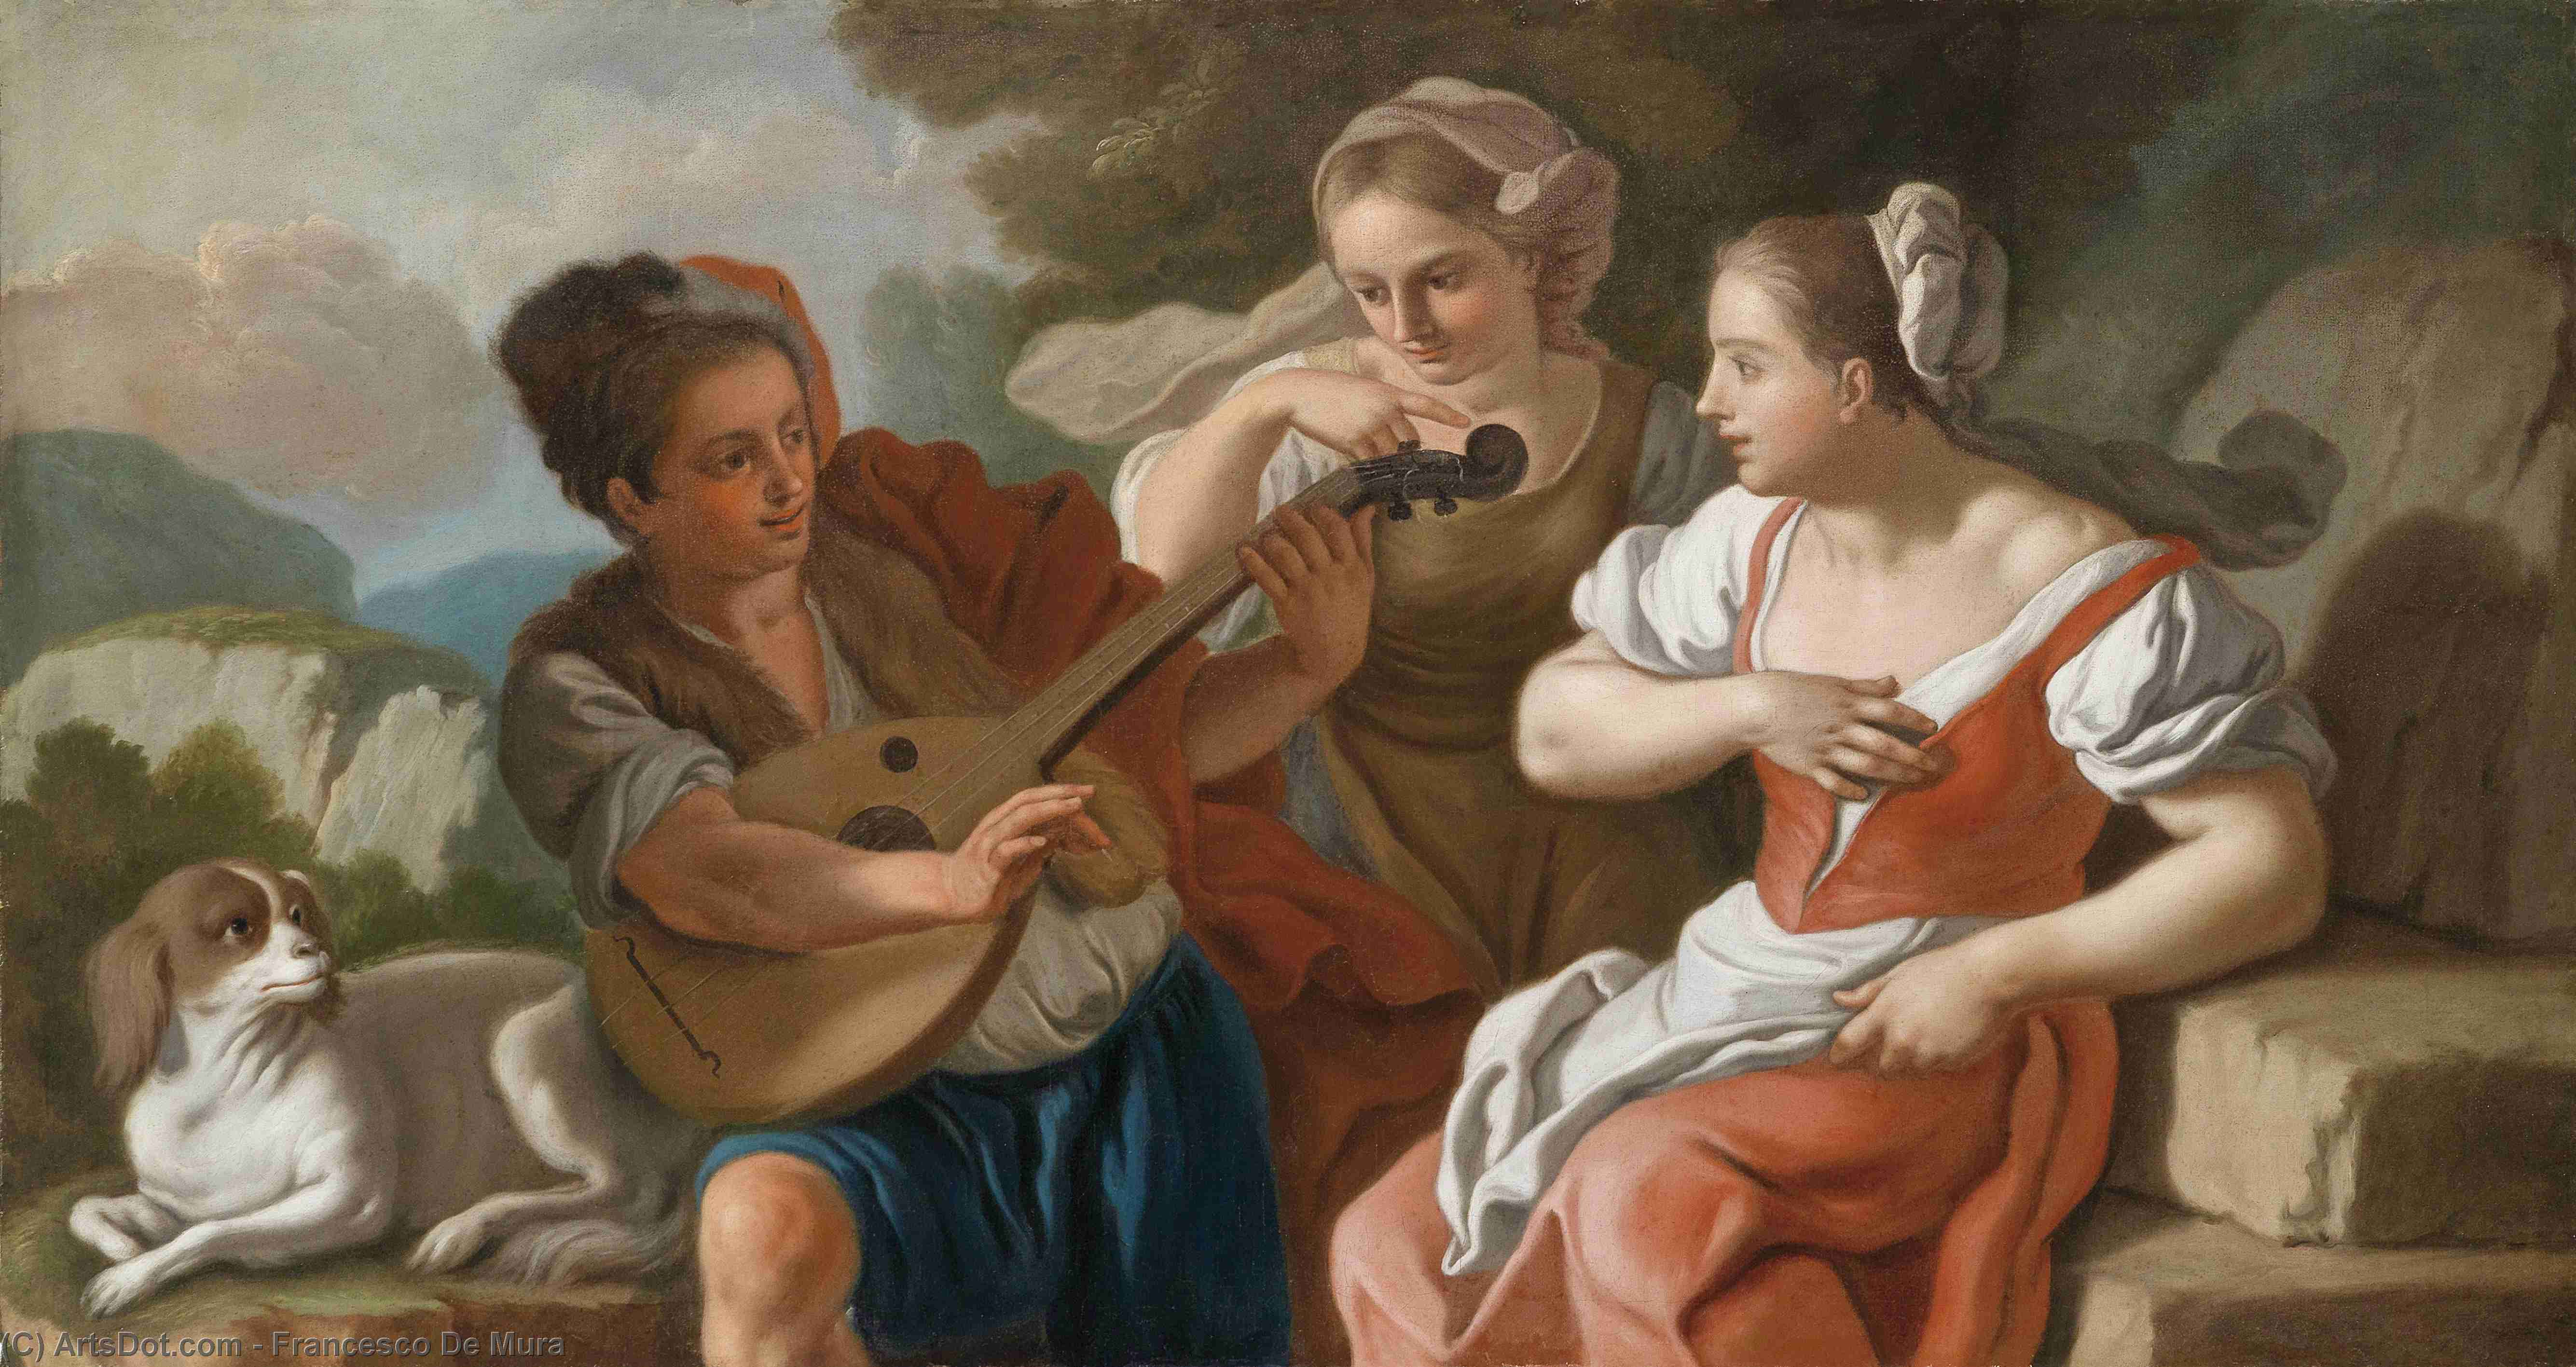 Wikioo.org - The Encyclopedia of Fine Arts - Painting, Artwork by Francesco De Mura - The lutenist